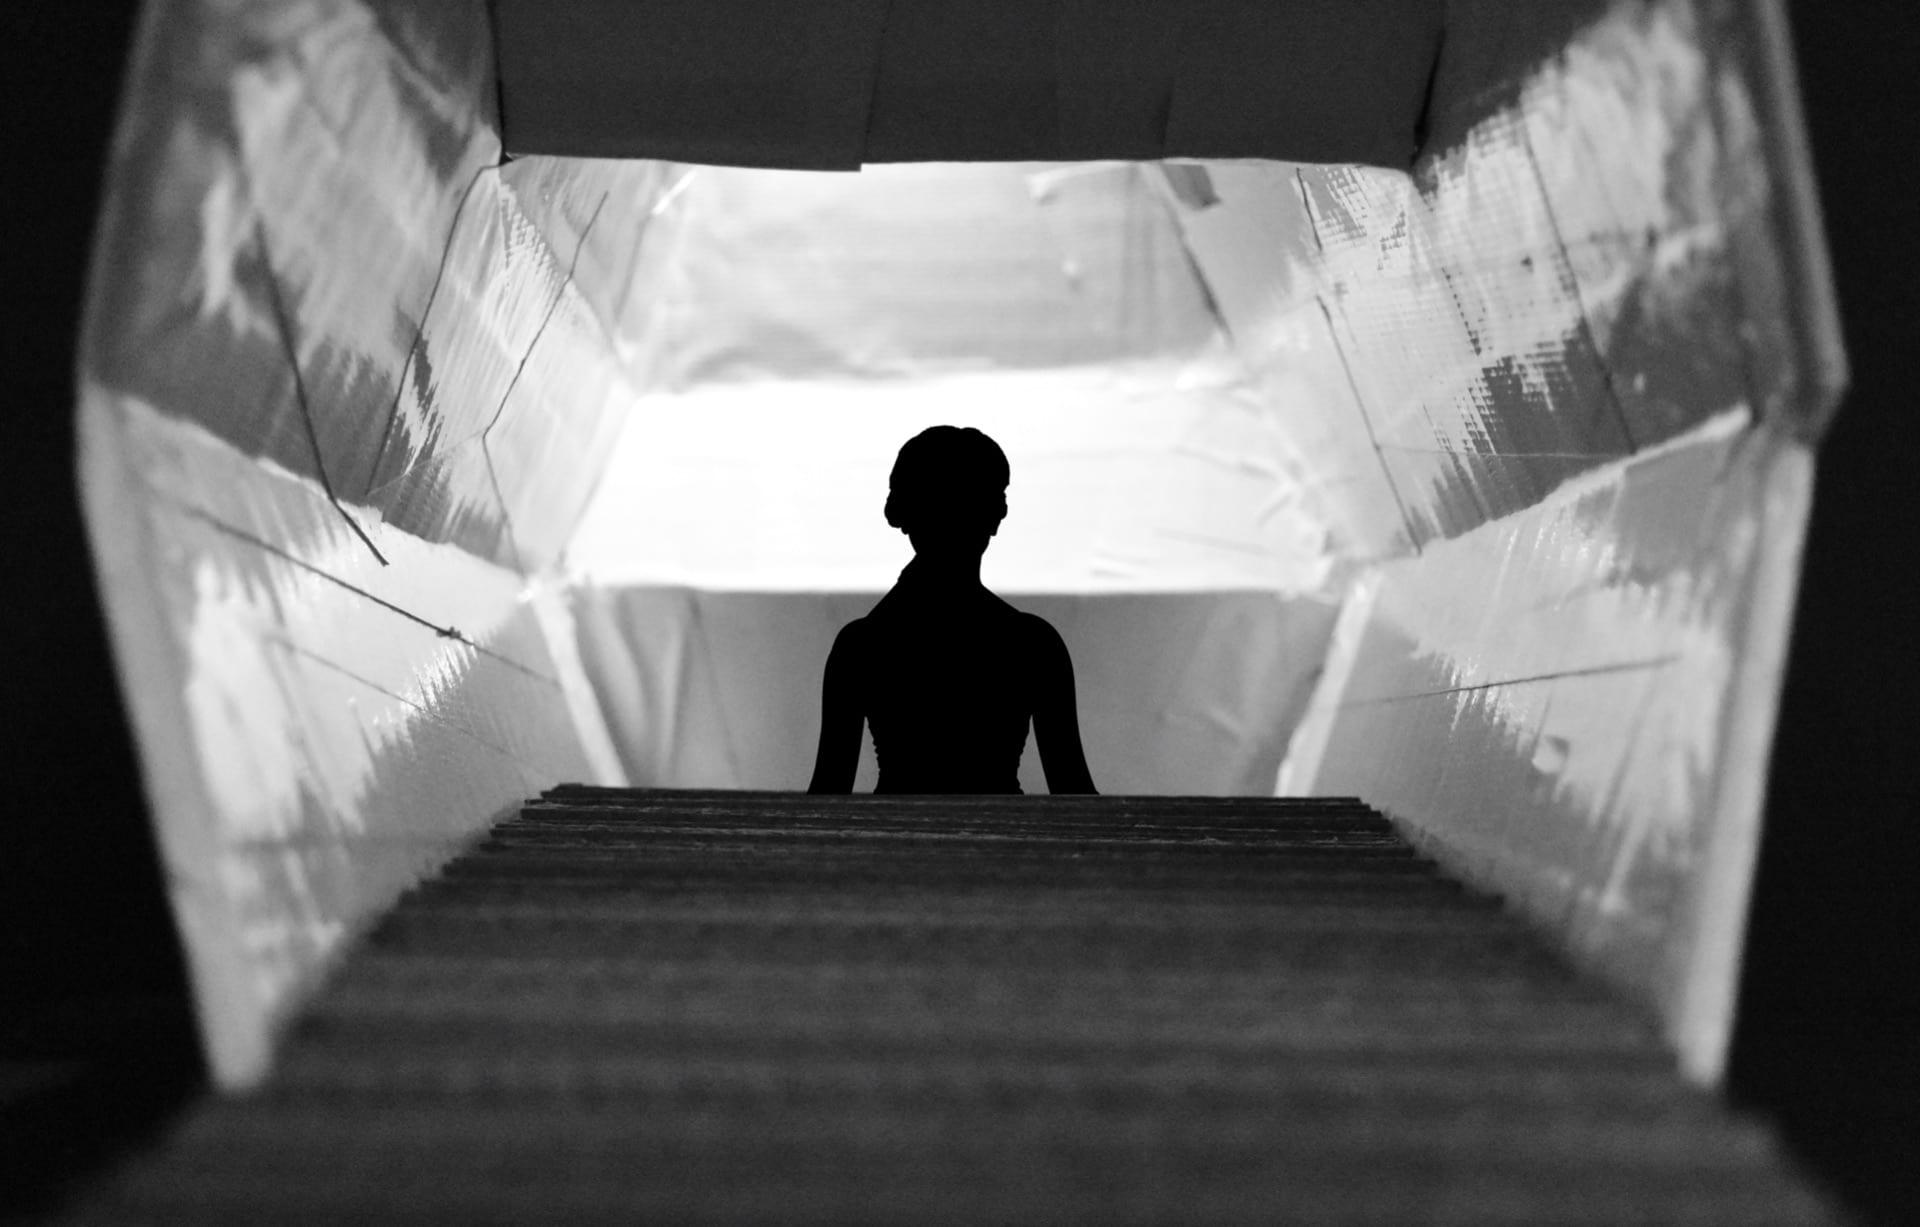 A Space for Sensory & Ritual